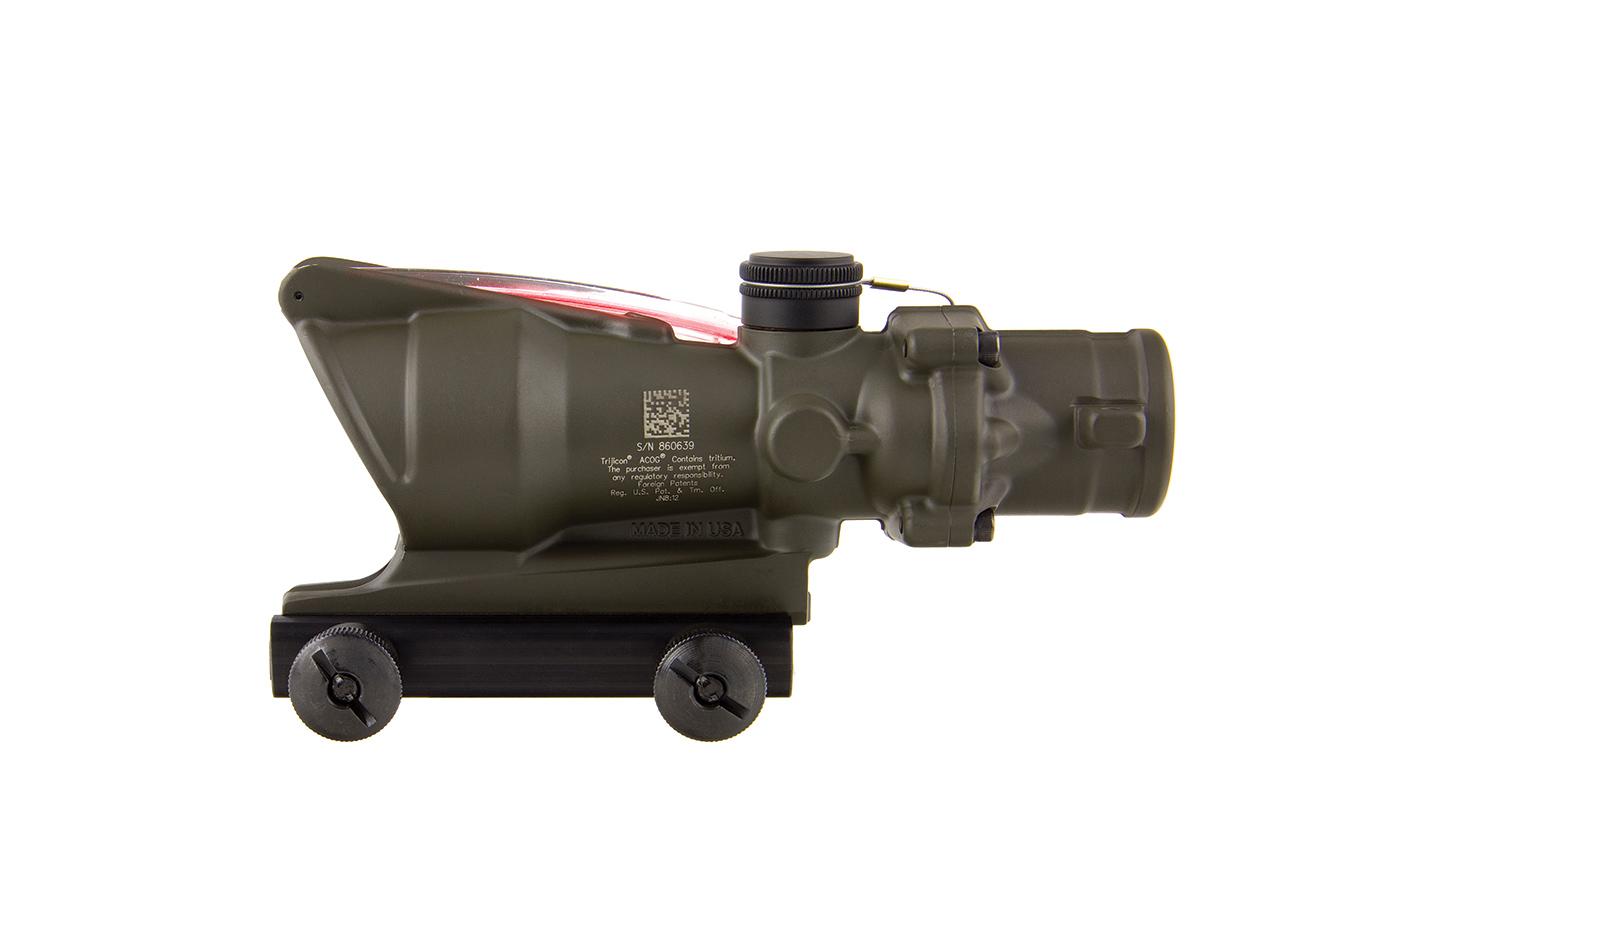 TA31-D-100309 angle 2